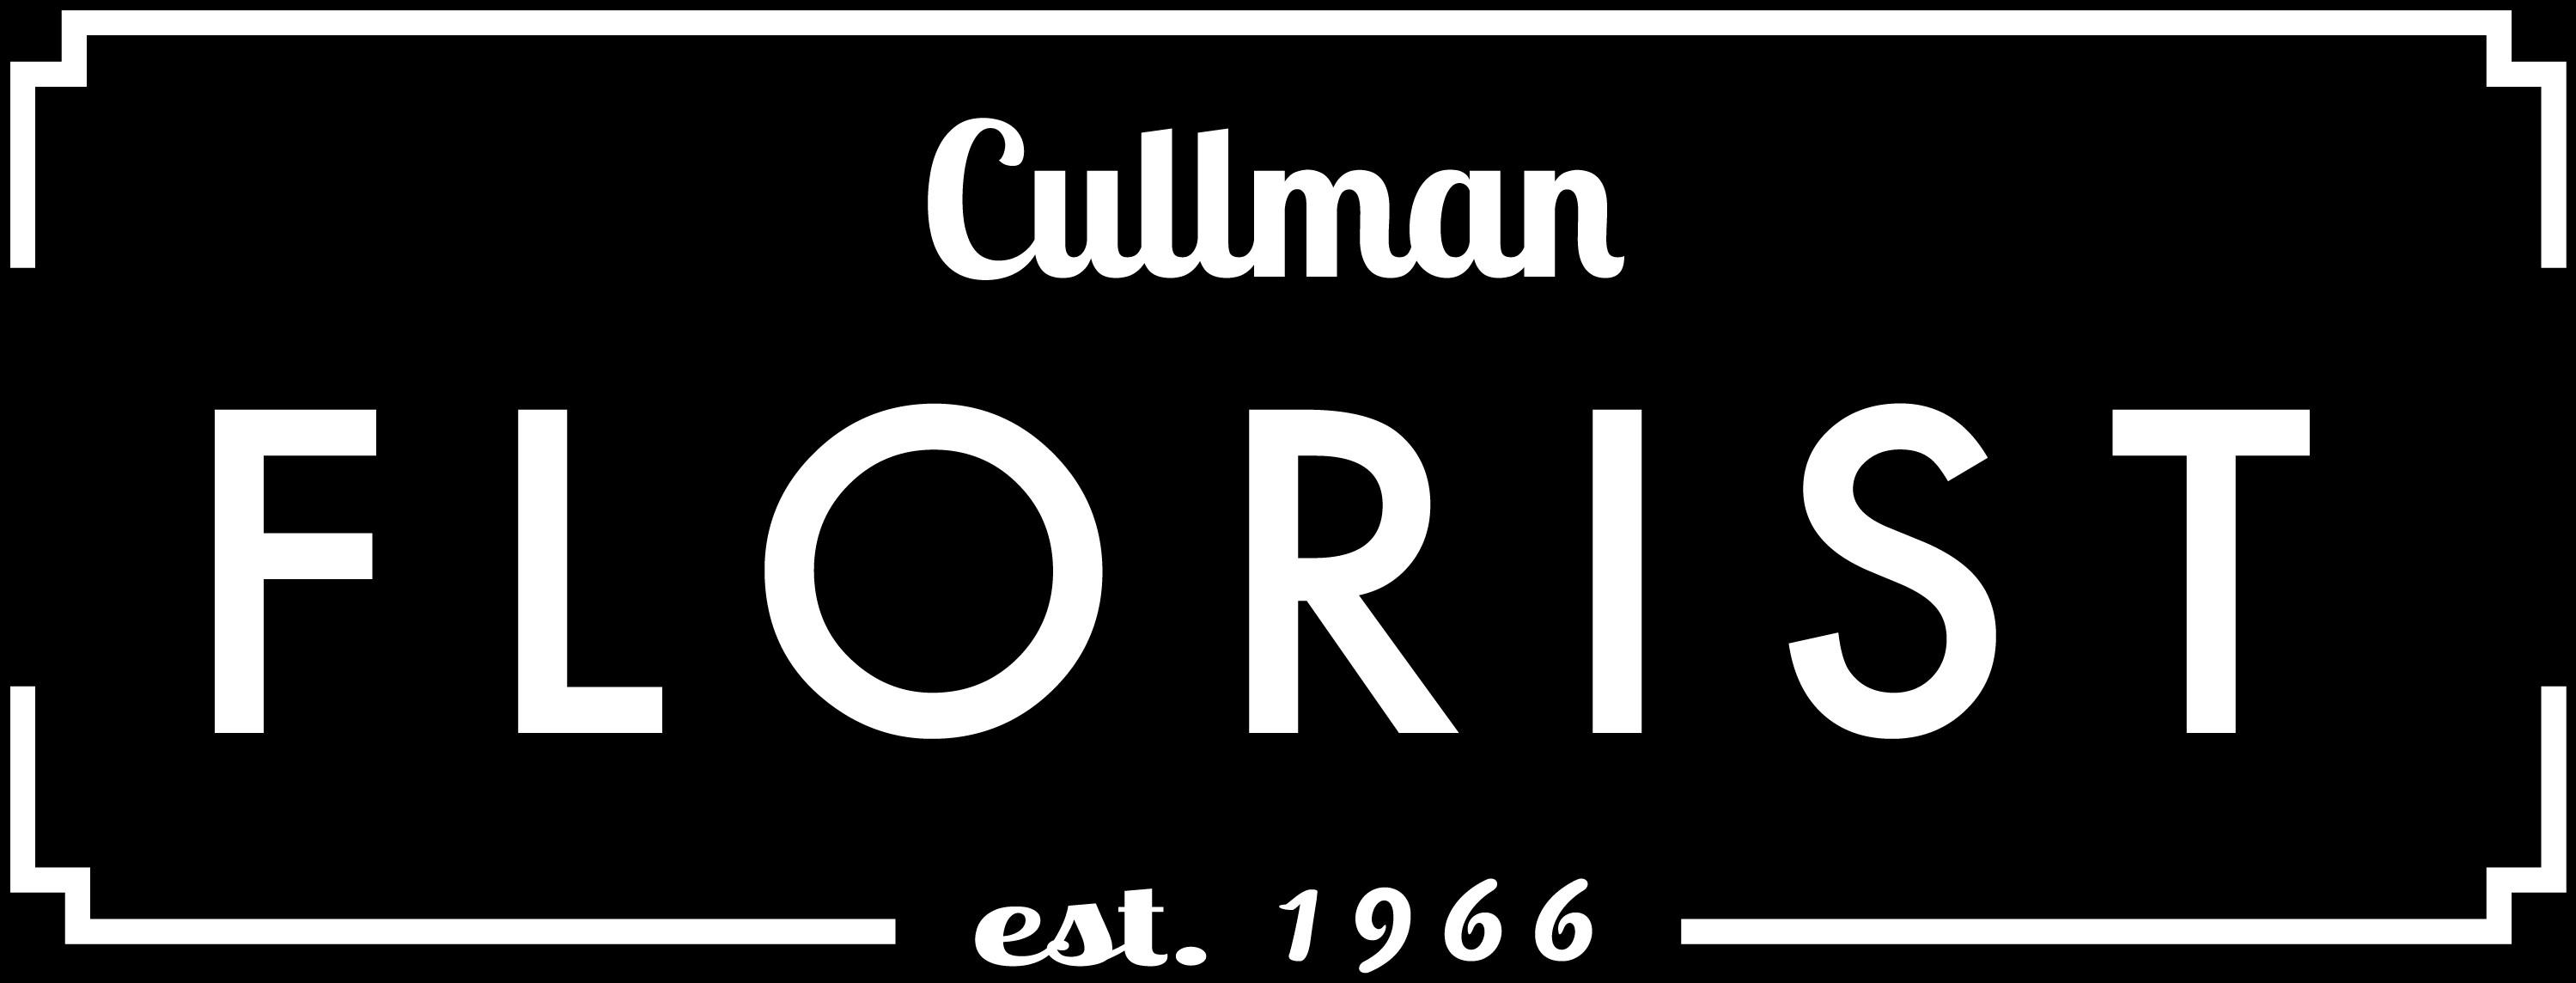 Cullman Florist